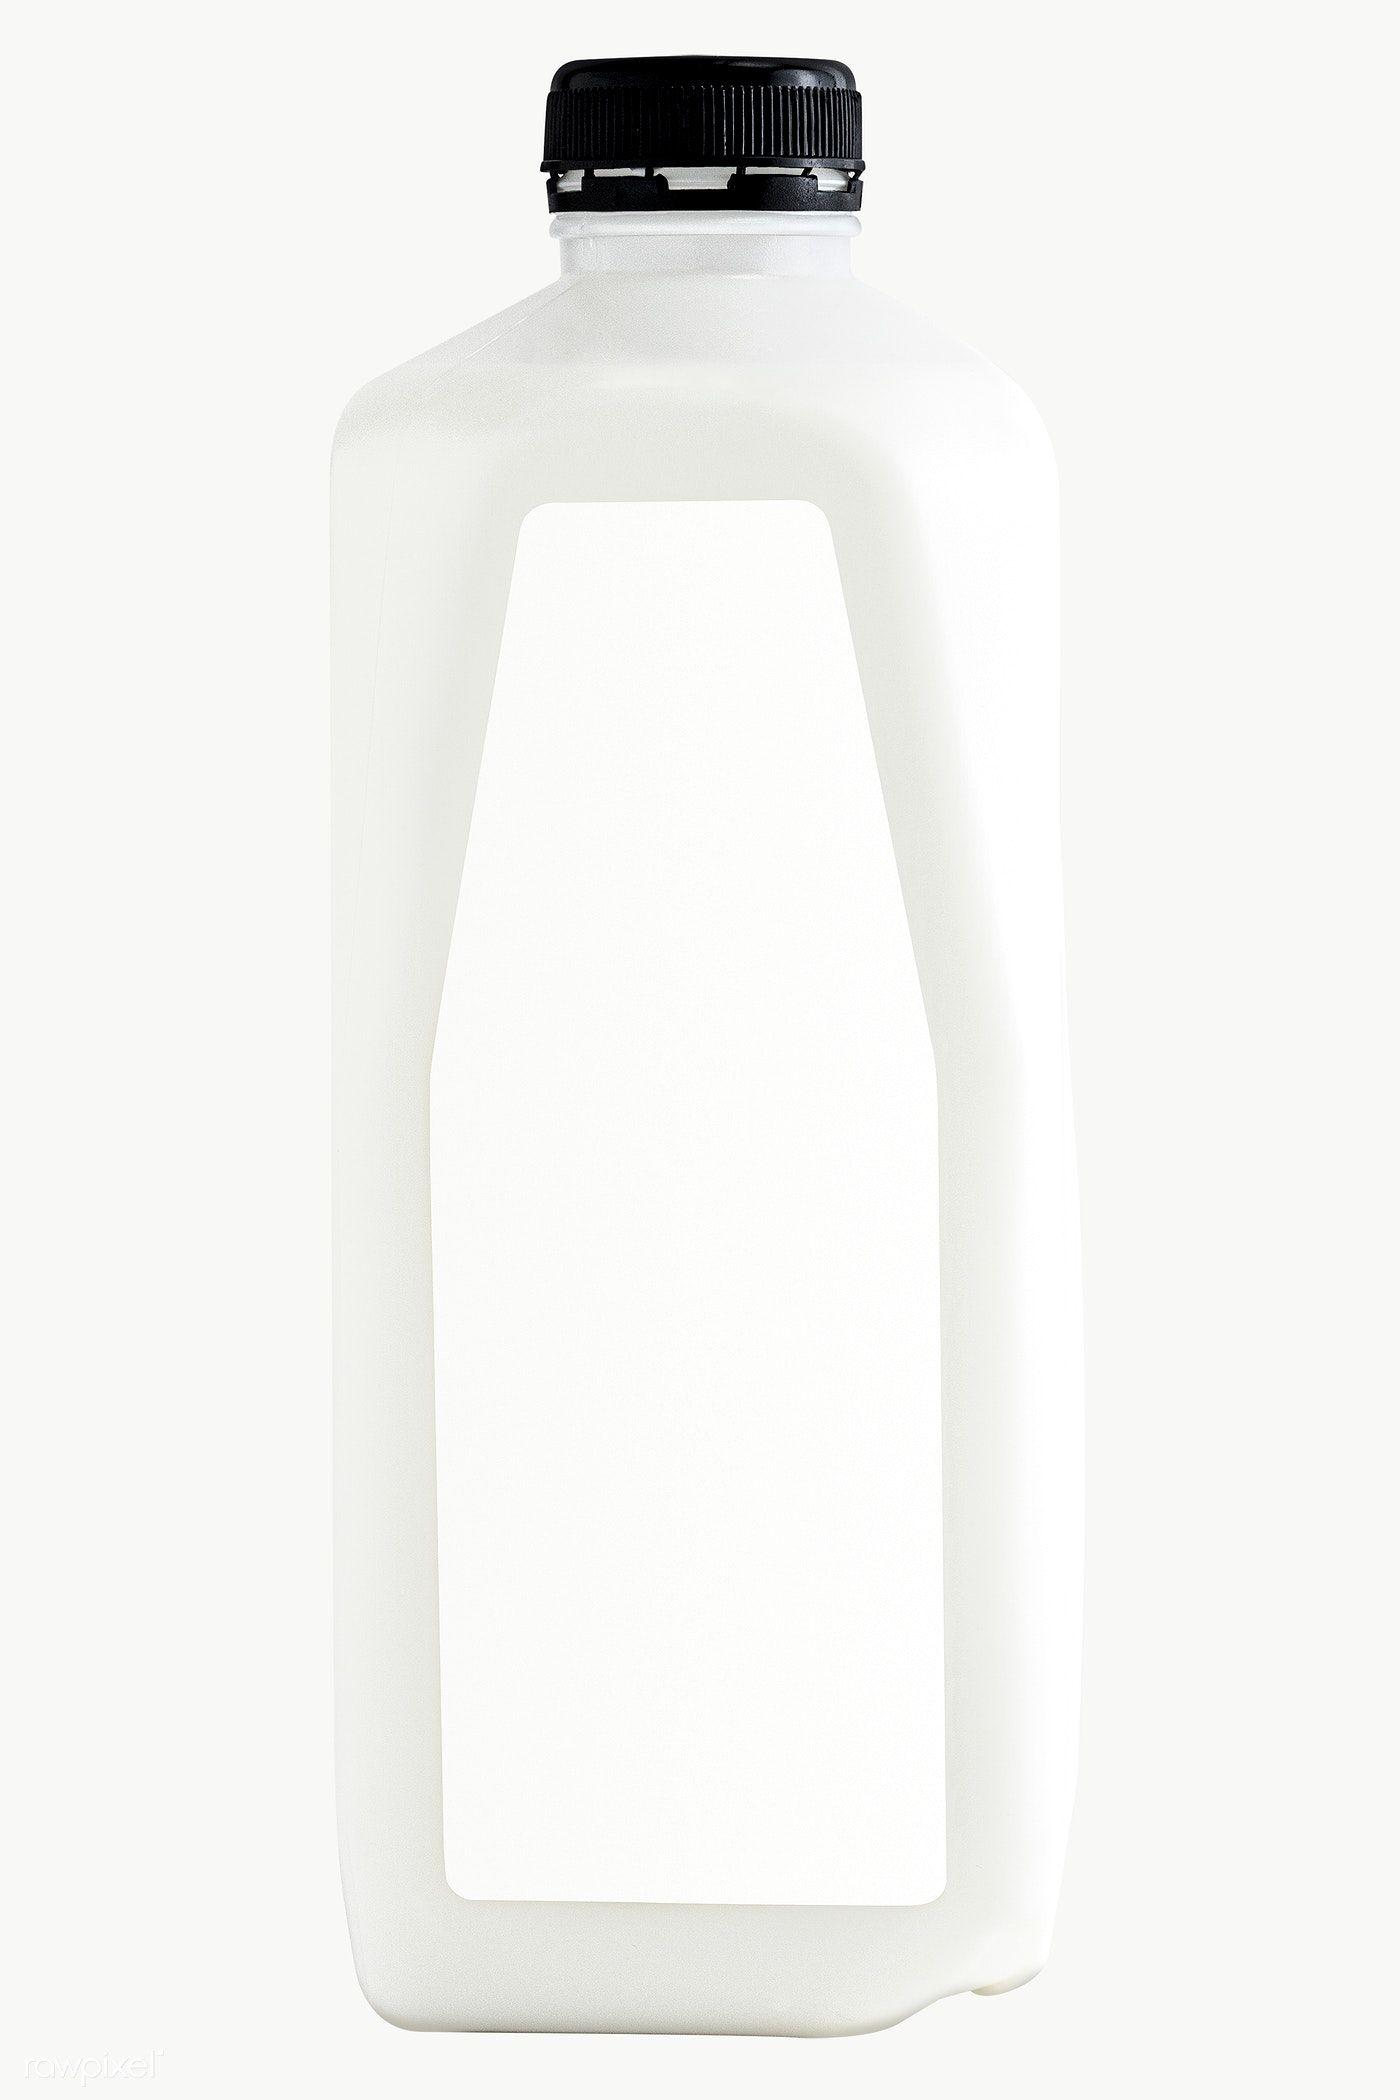 Fresh Milk In A Glass Bottle Design Element Free Image By Rawpixel Com Teddy Rawpixel Bottle Design Glass Bottles Design Element